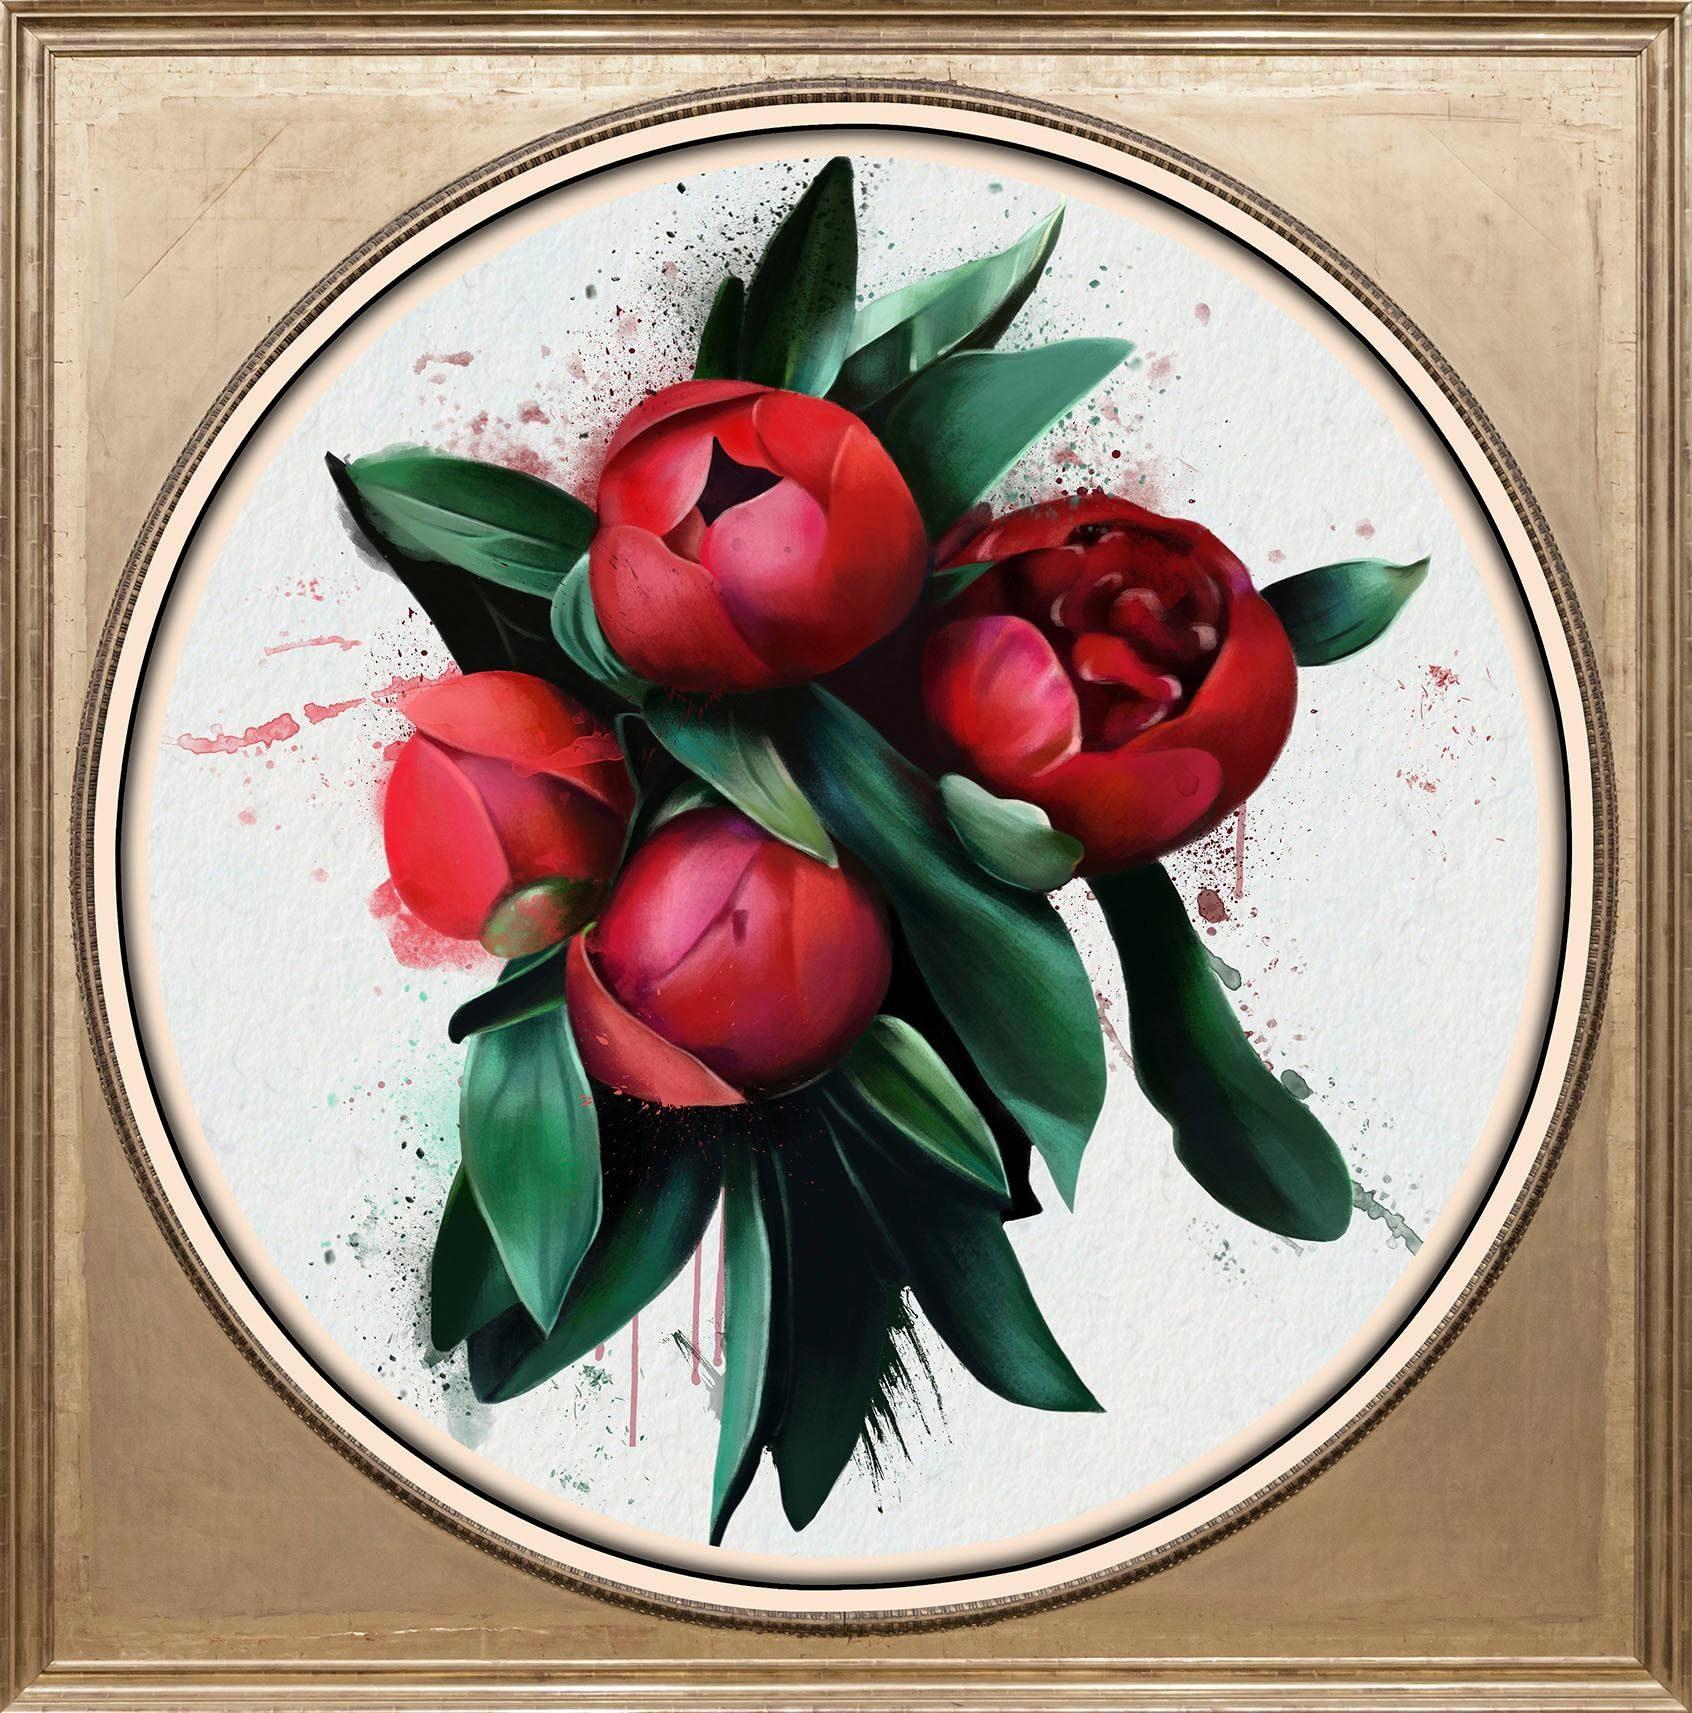 Acrylglasbild »Rote Blüte«